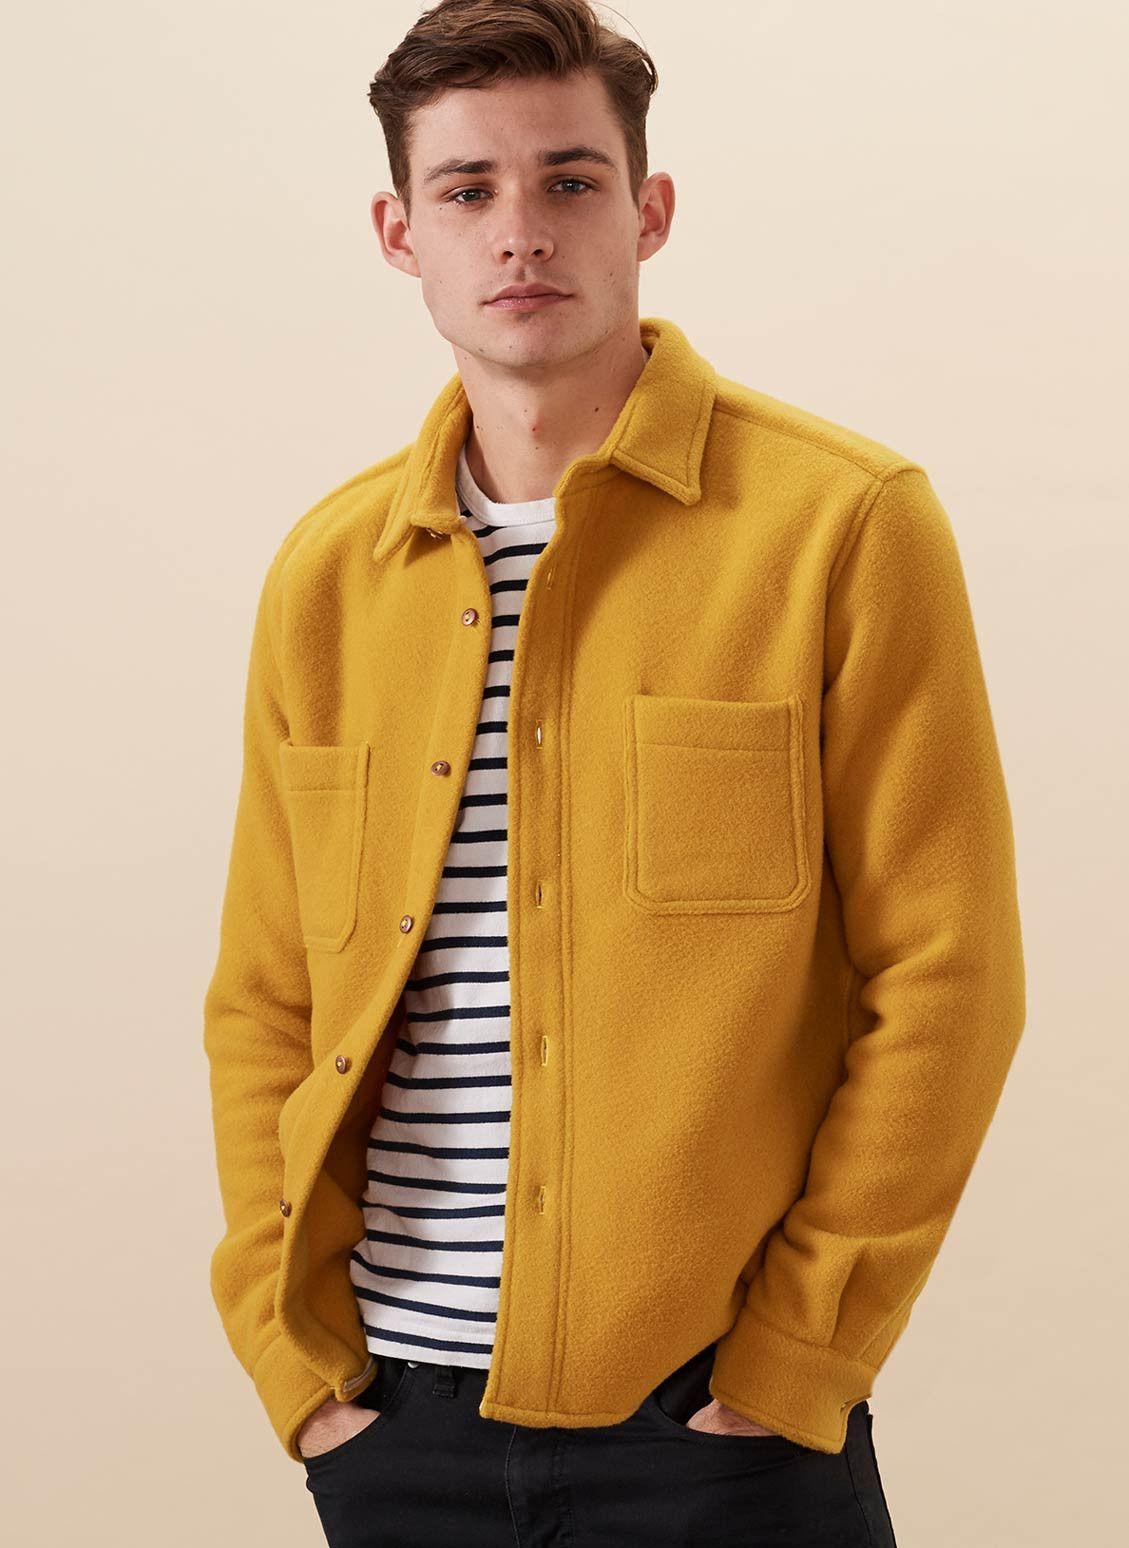 Overshirt Yellow Fleece Http Www 99wtf Net Men Mens Fasion Fit